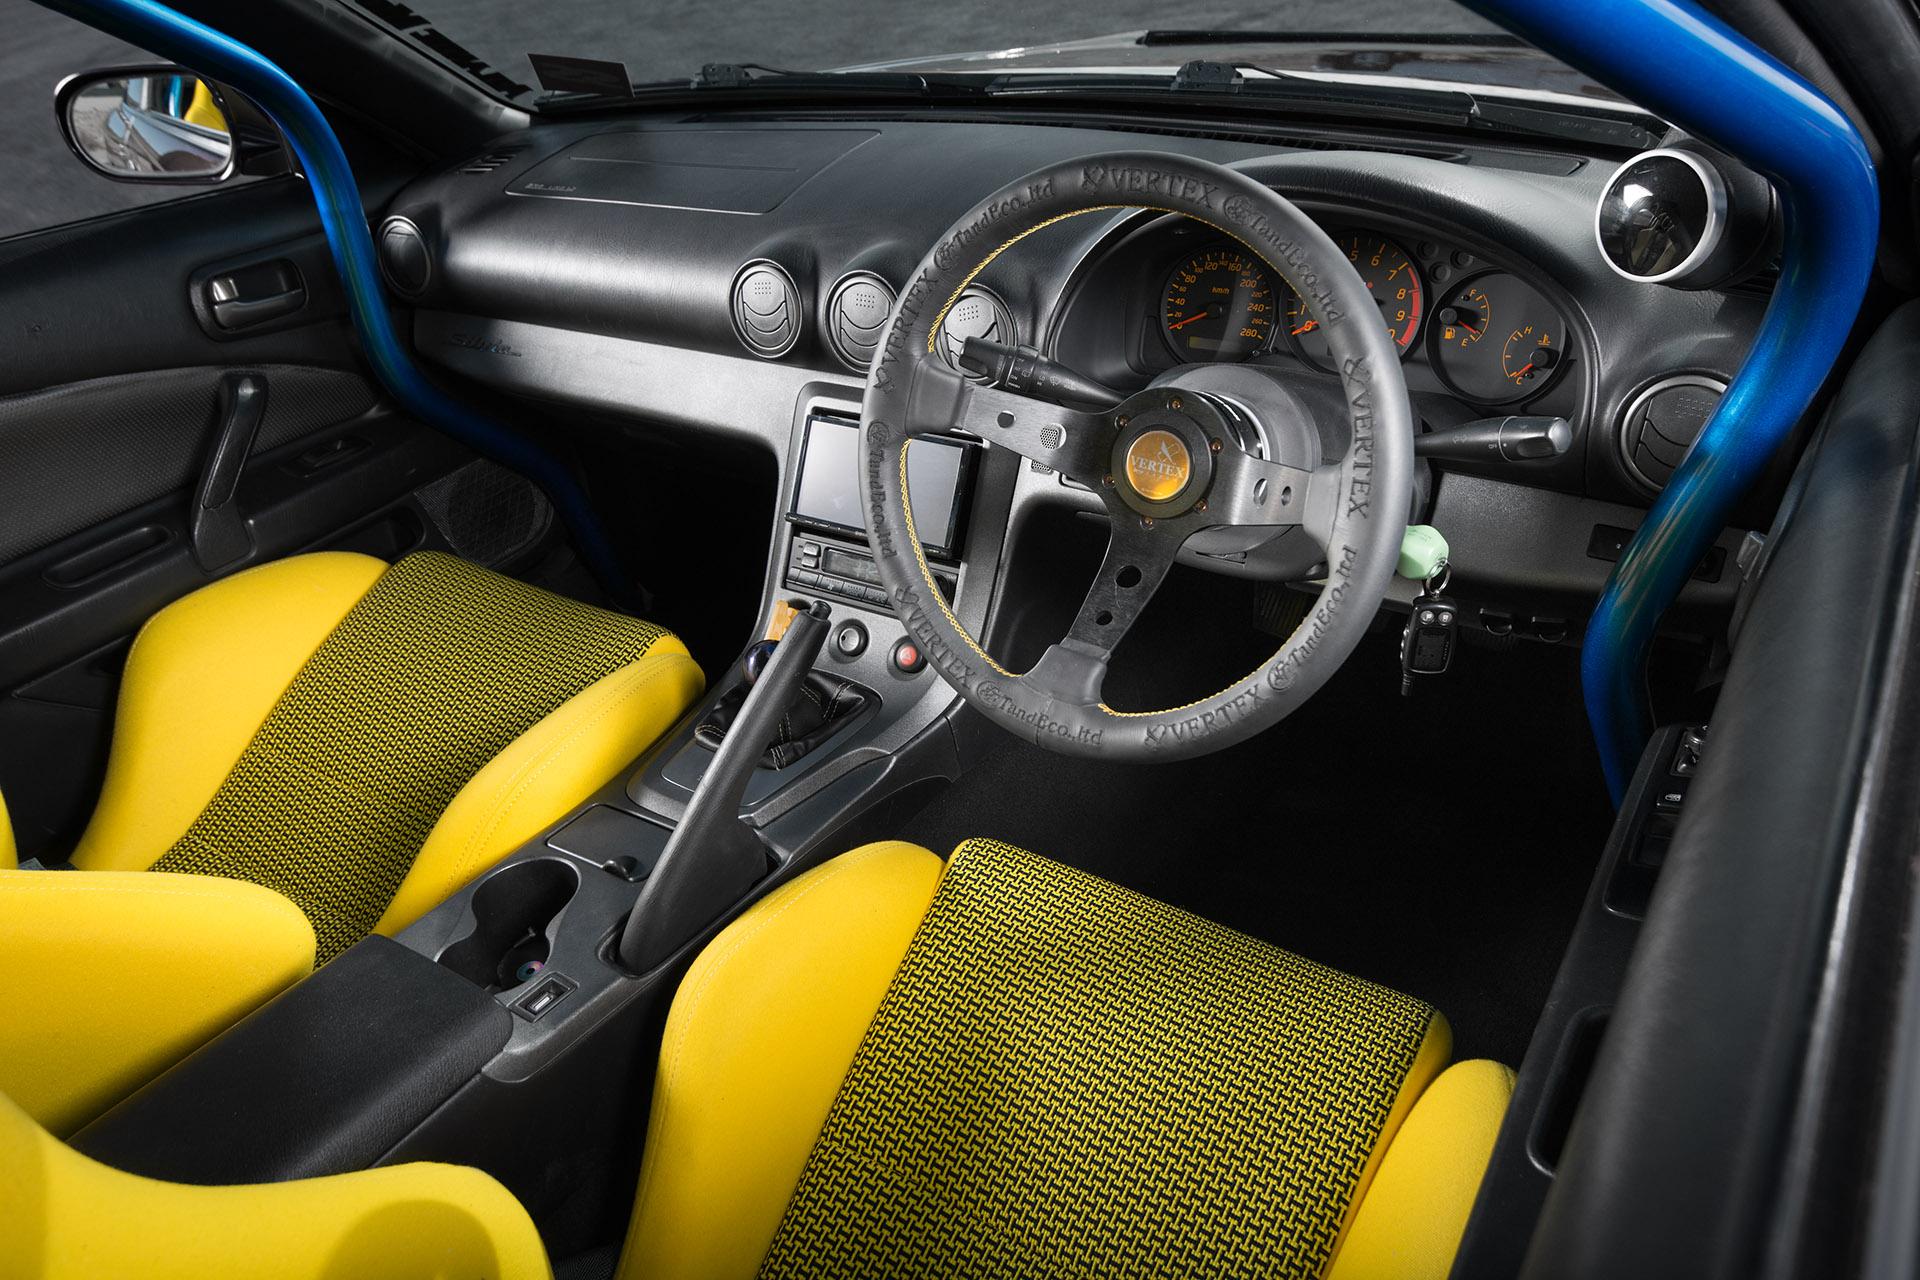 Nissan RB26DETT swapped Midnight Purple III S15 Silvia Super Street magazine interior yellow seats steering wheel automotive photography